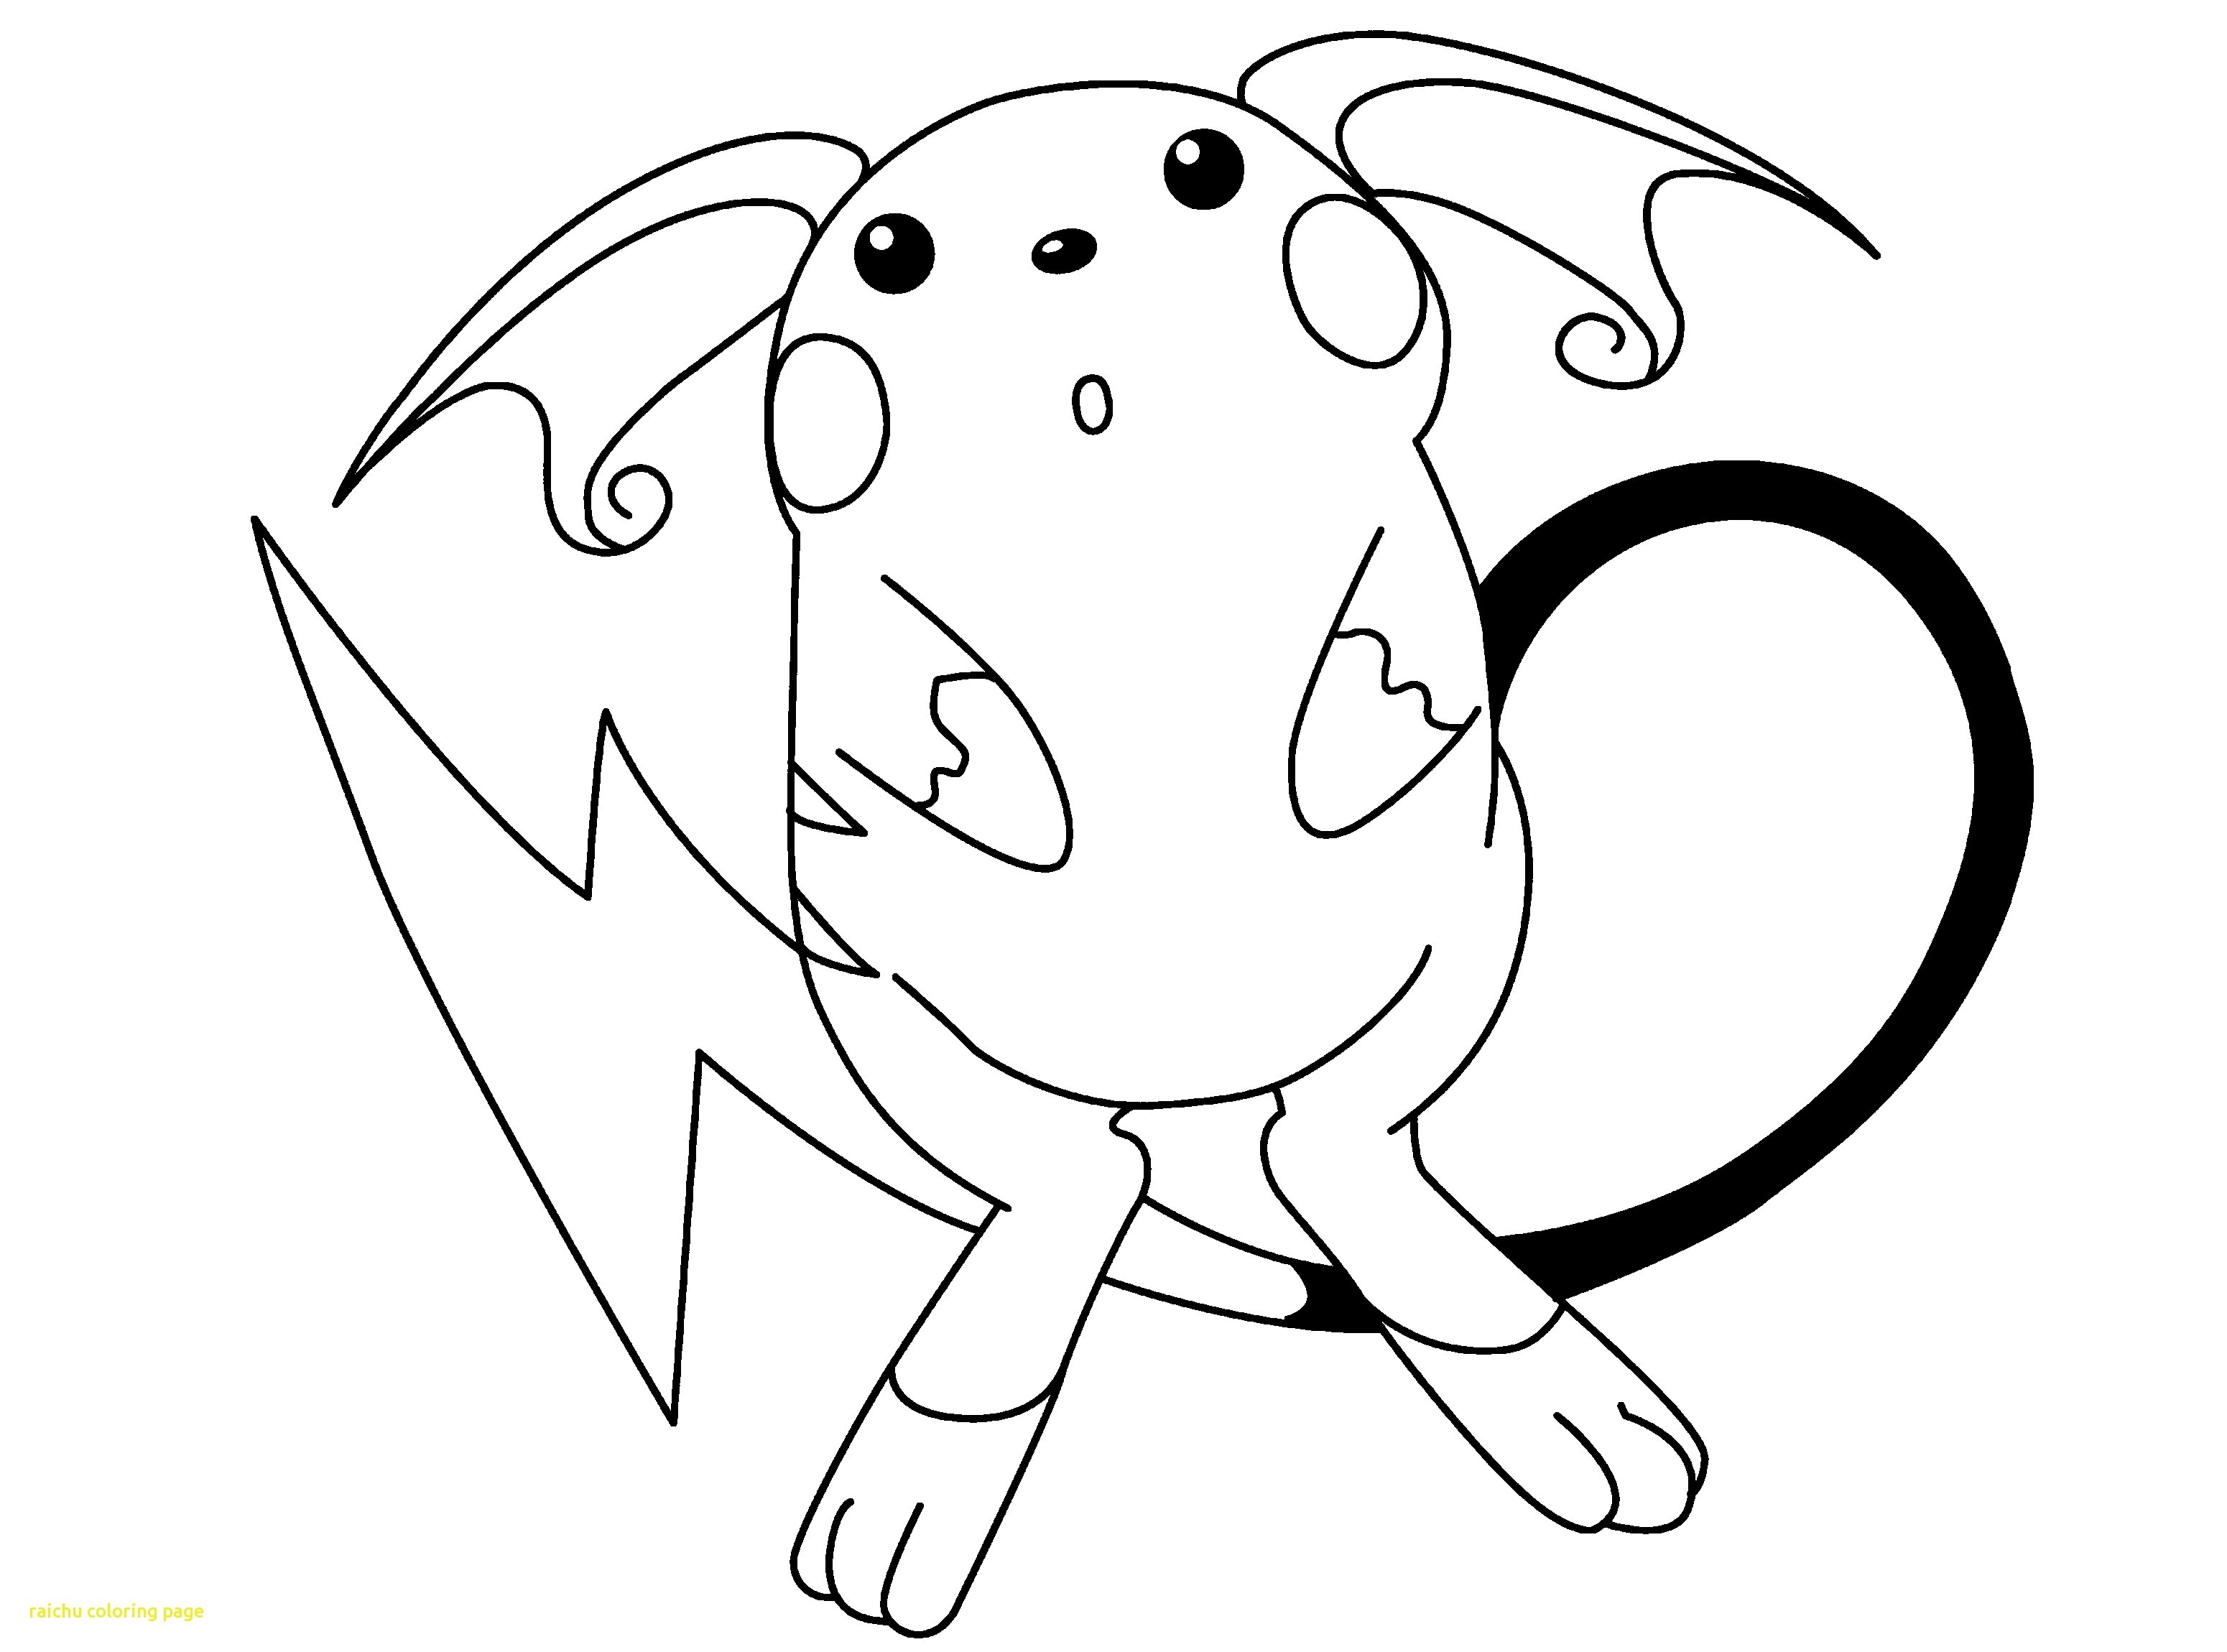 Raichu Pokemon Coloring Pages At Getdrawings Free Download